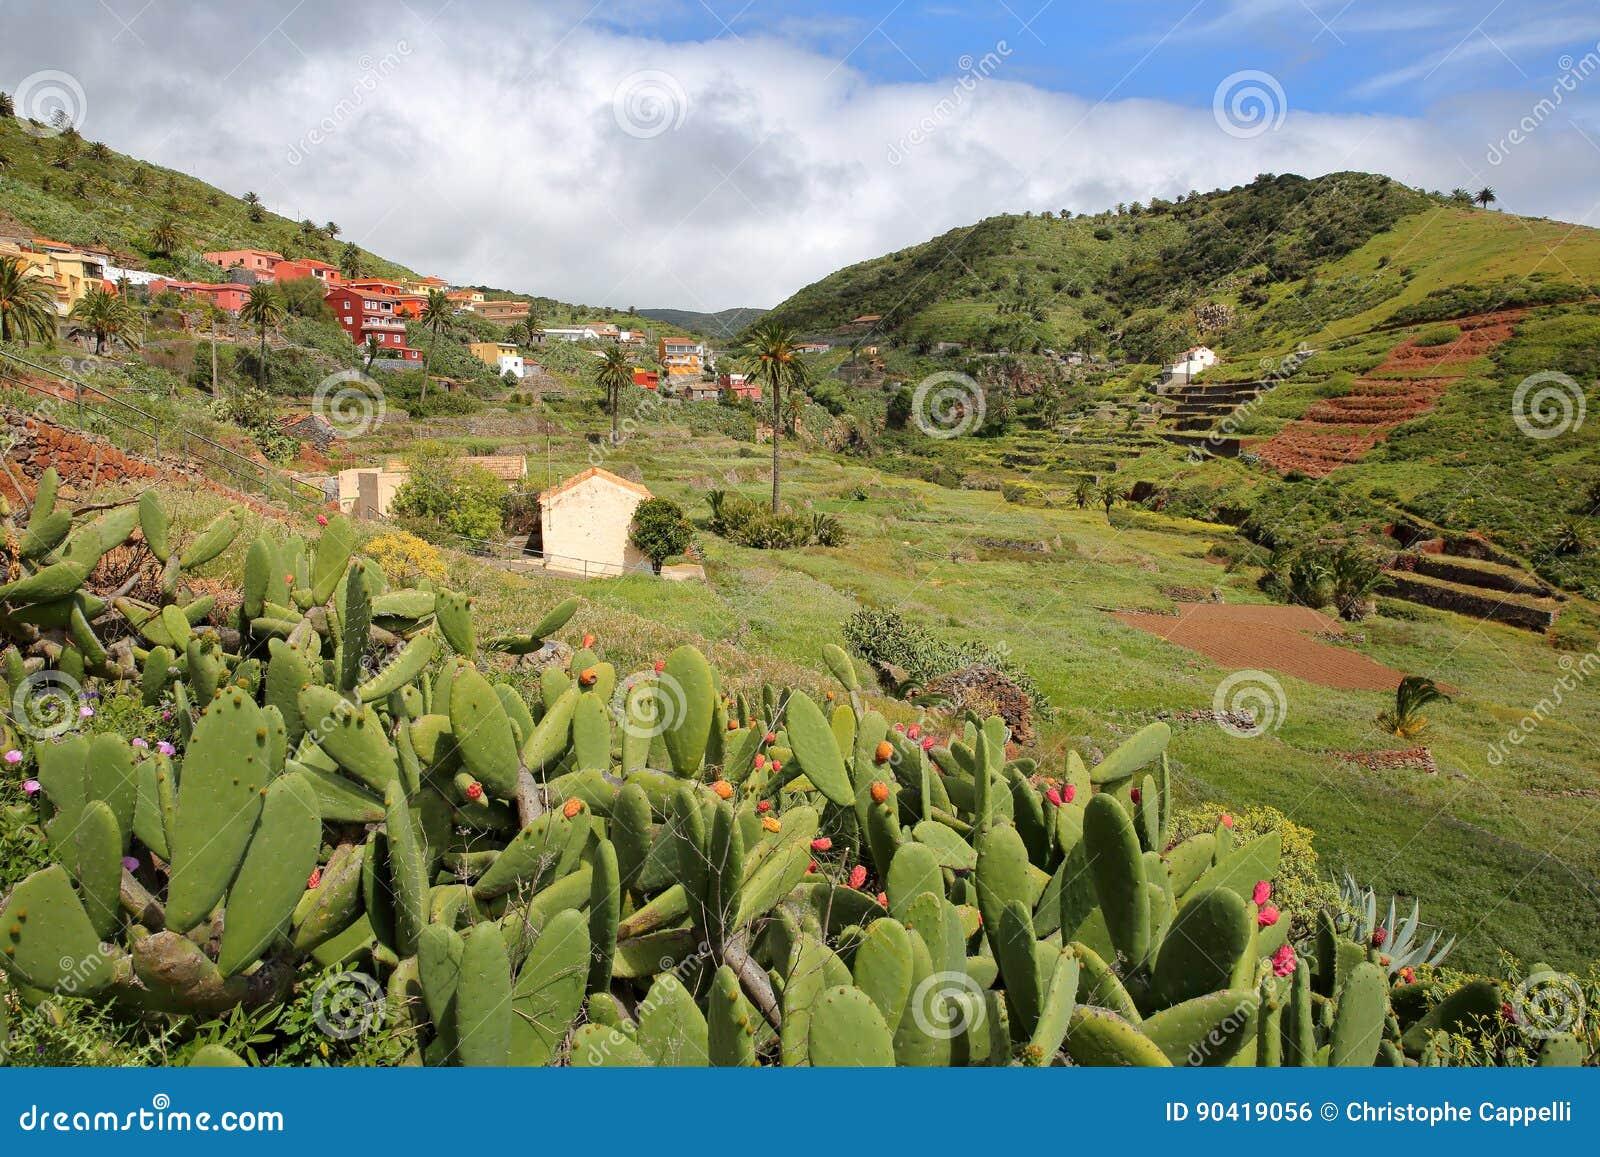 ARURE,戈梅拉岛,西班牙:在Arure附近的培养的露台的领域与前景的仙人掌植物